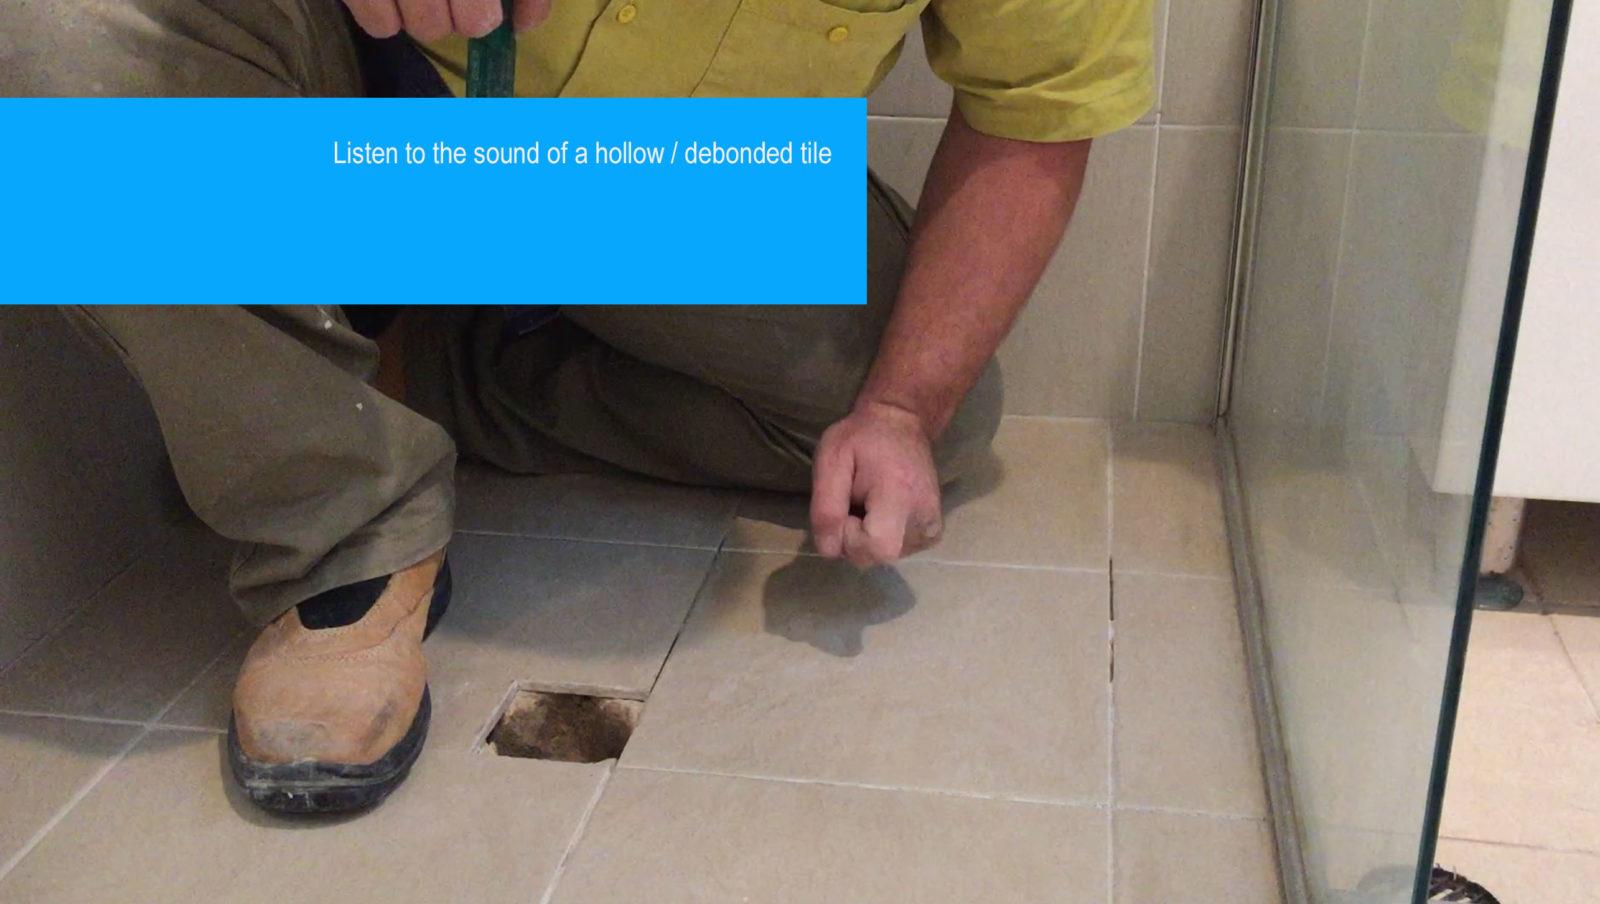 Drummy floor tile sounding video, listen to hollow sound tile vs the solid bonded tile sound